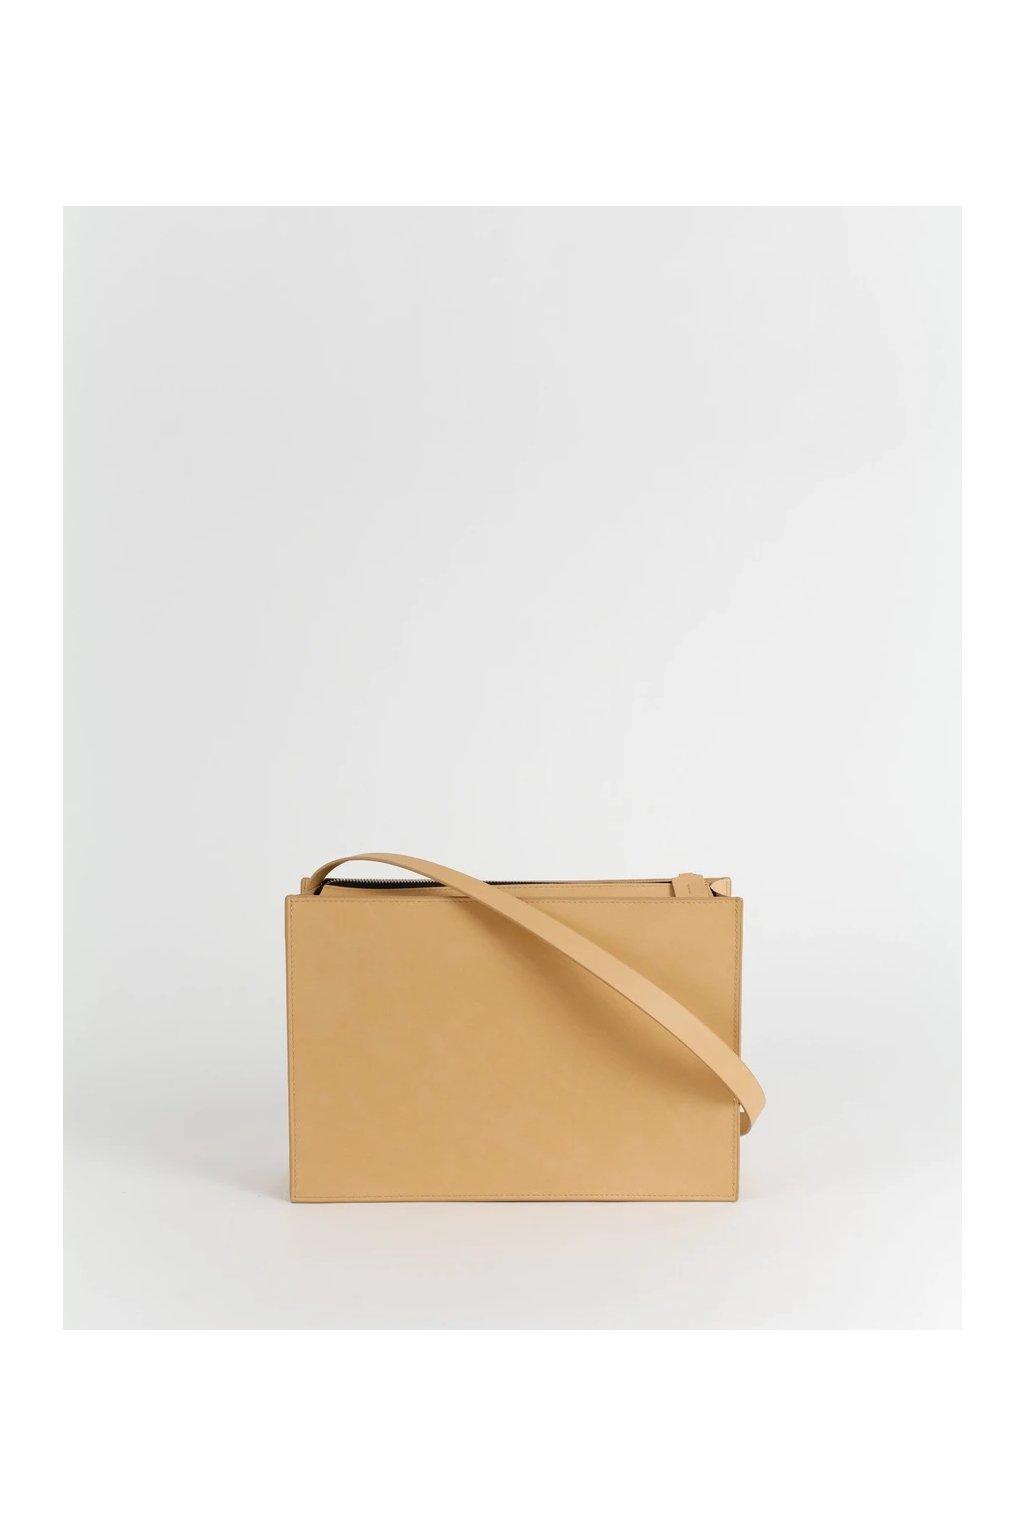 Josefa - kabelka z recyklovanej kože